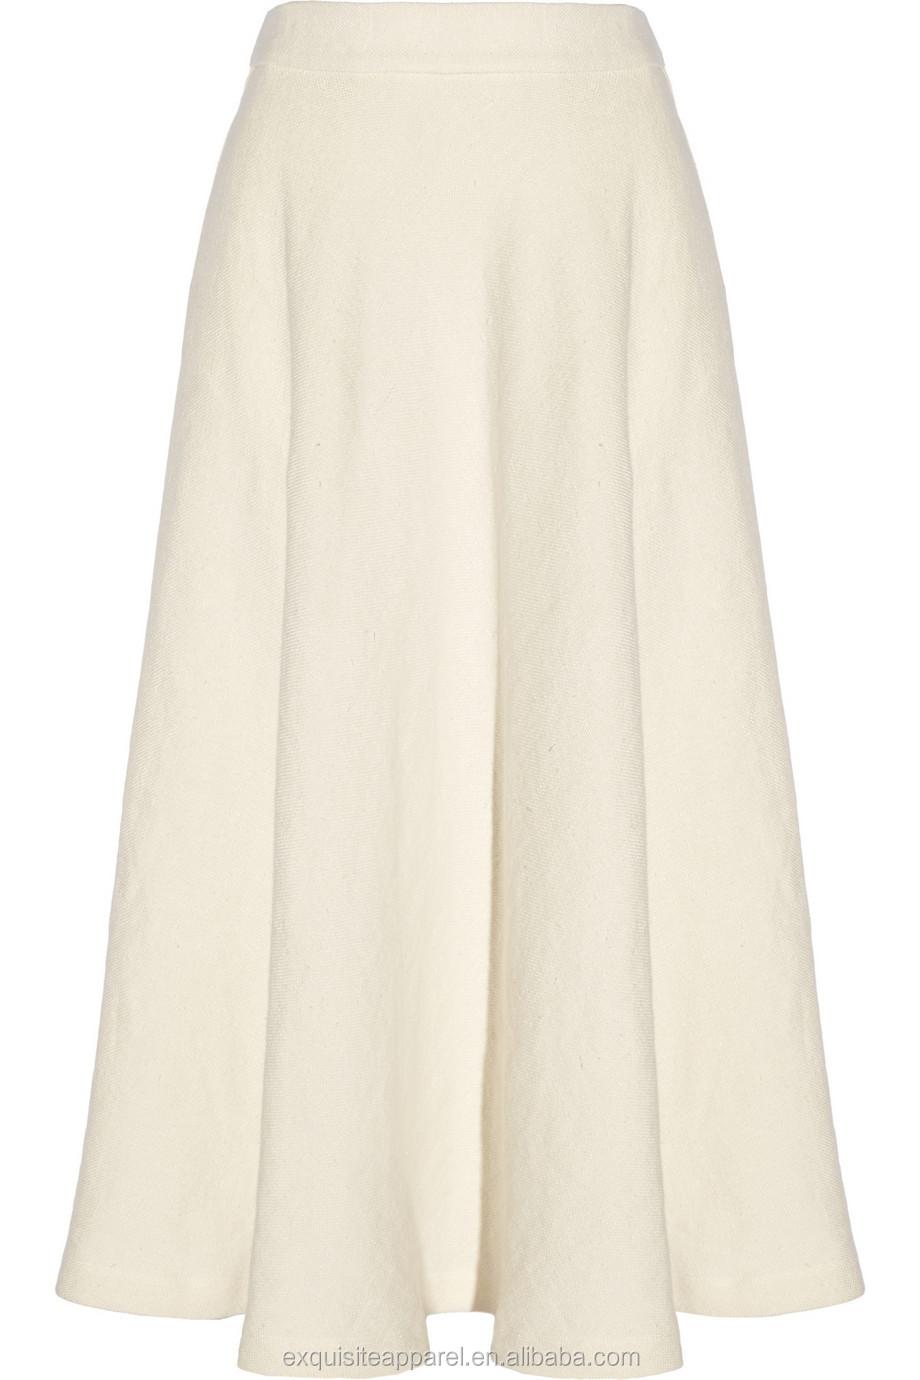 0be0cdf31dca29 Custom lange linnen rok effen witte katoenen rokken vrouwen cothing  guangzhou china fabrikant